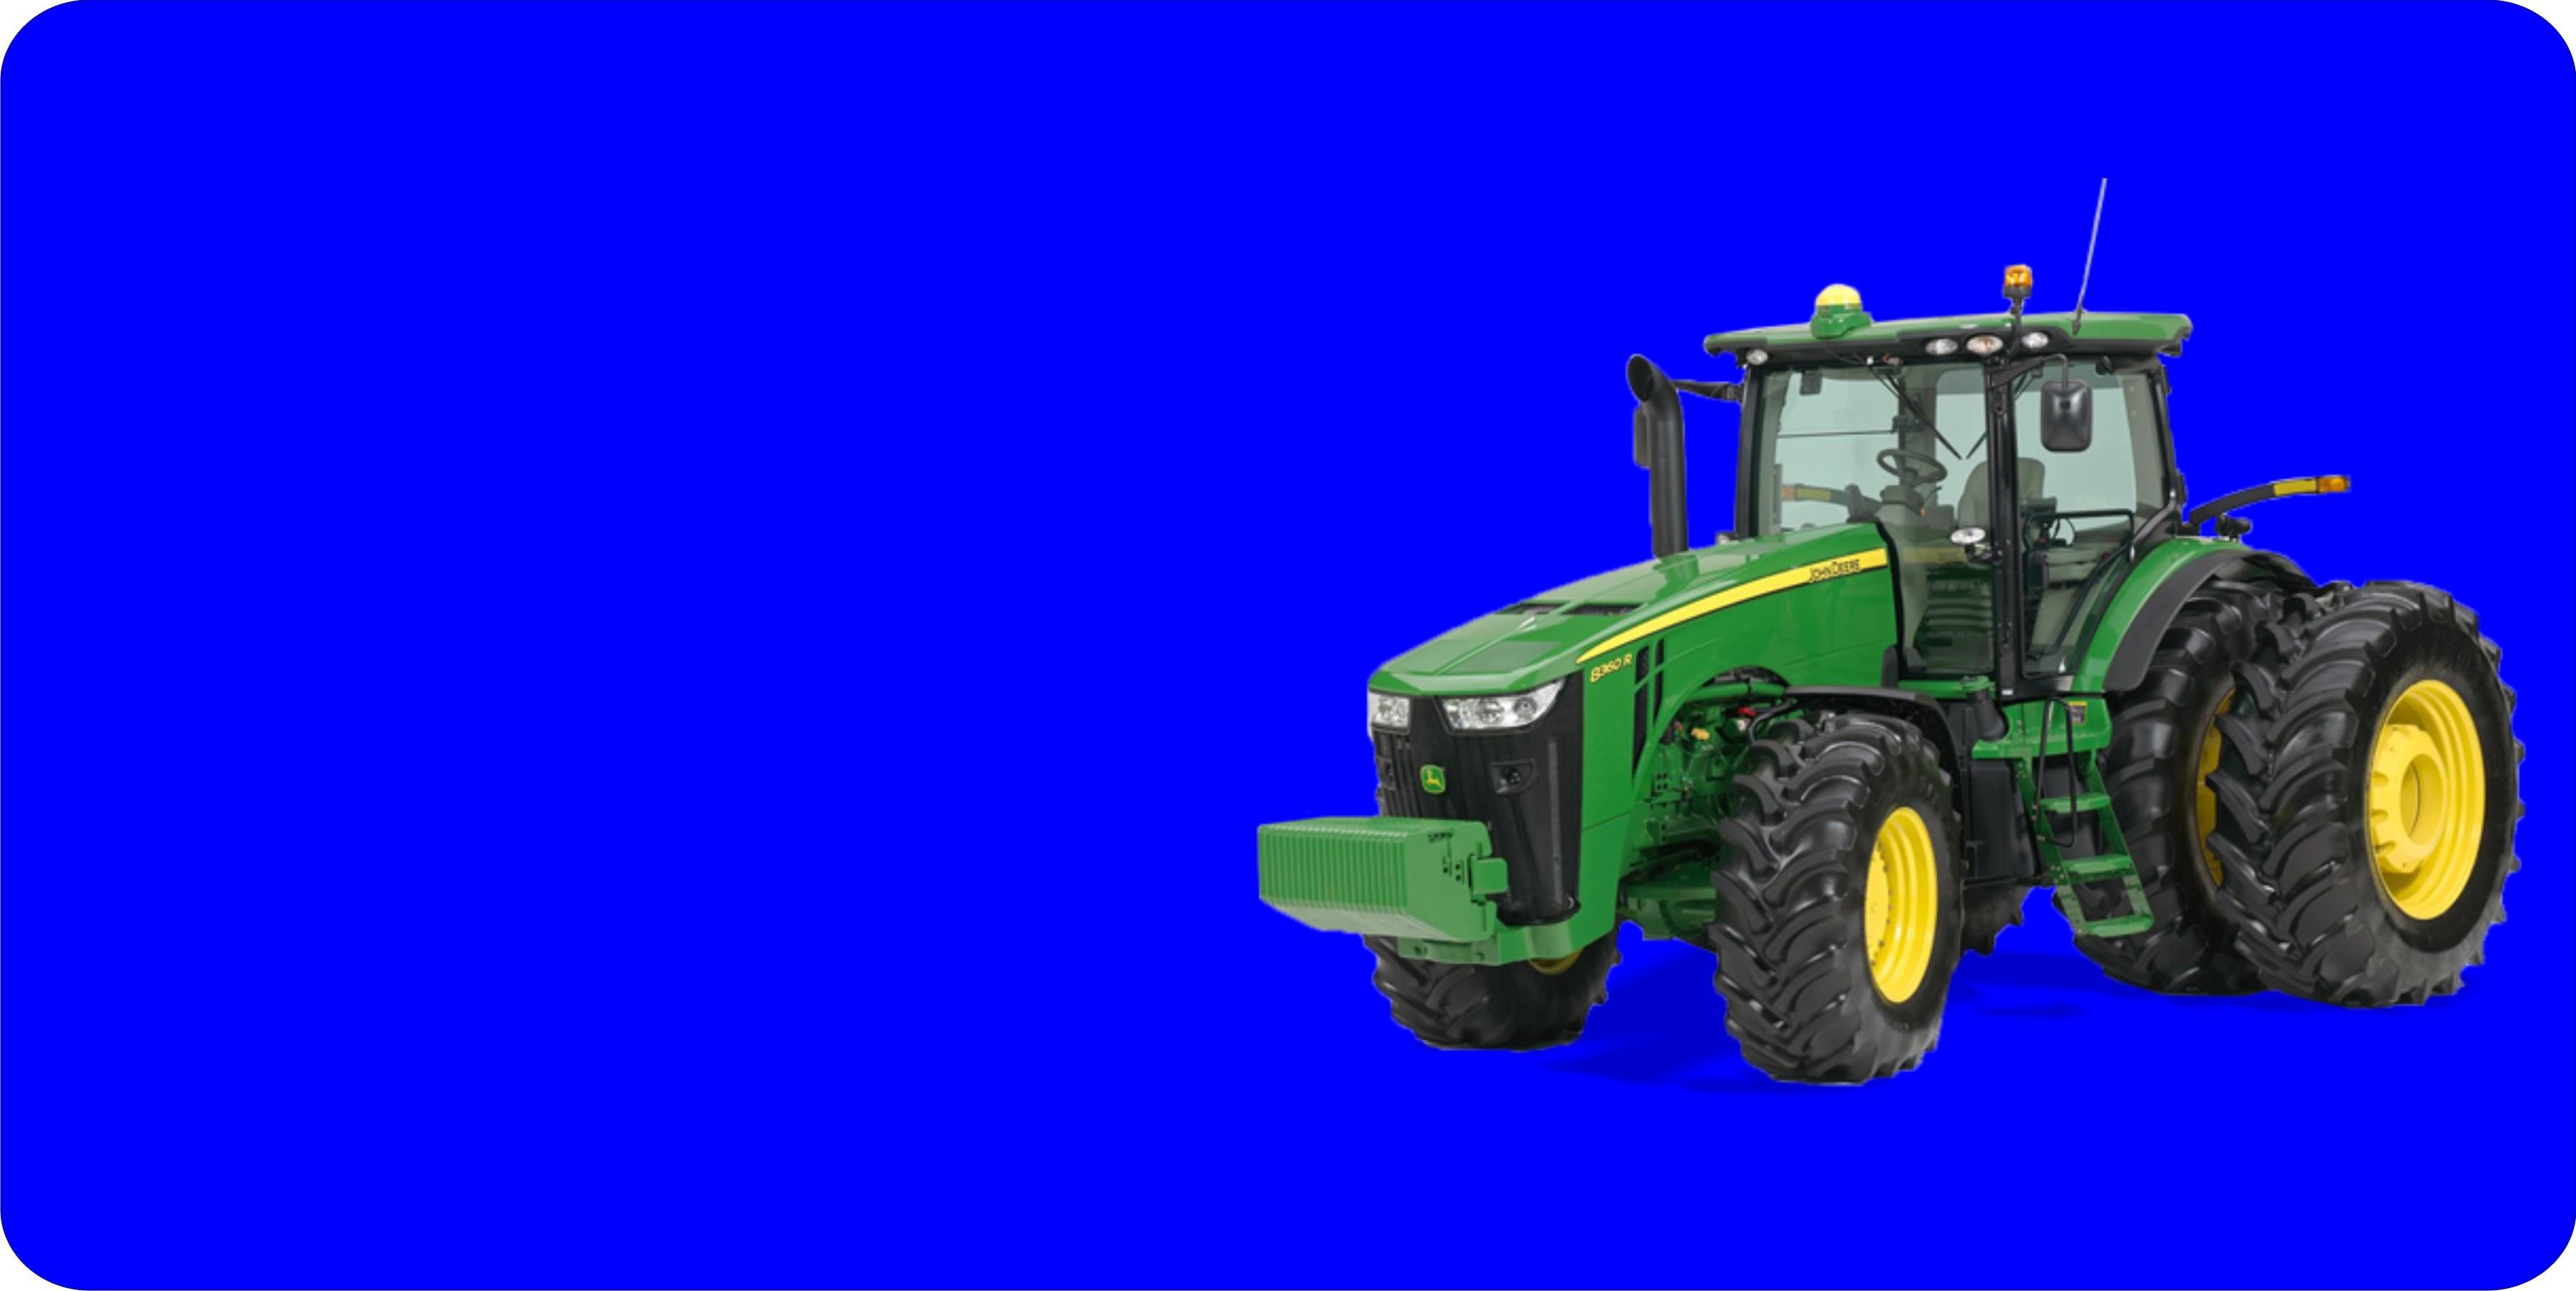 JOHN DEERE Tractor Offset On Blue Plate